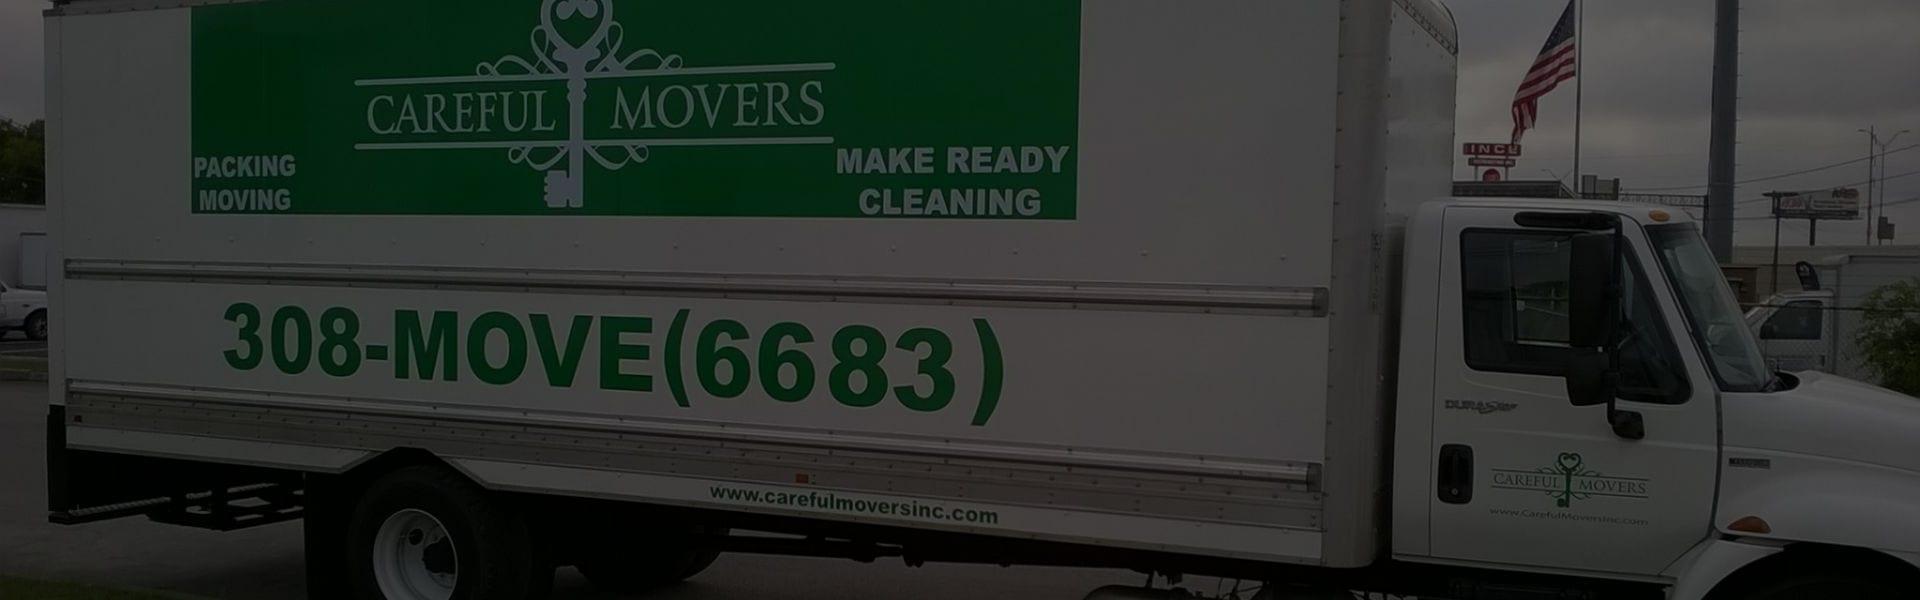 San Antonio Moving Company blog san antonio local movers san antonio movers san antonio commercial movers